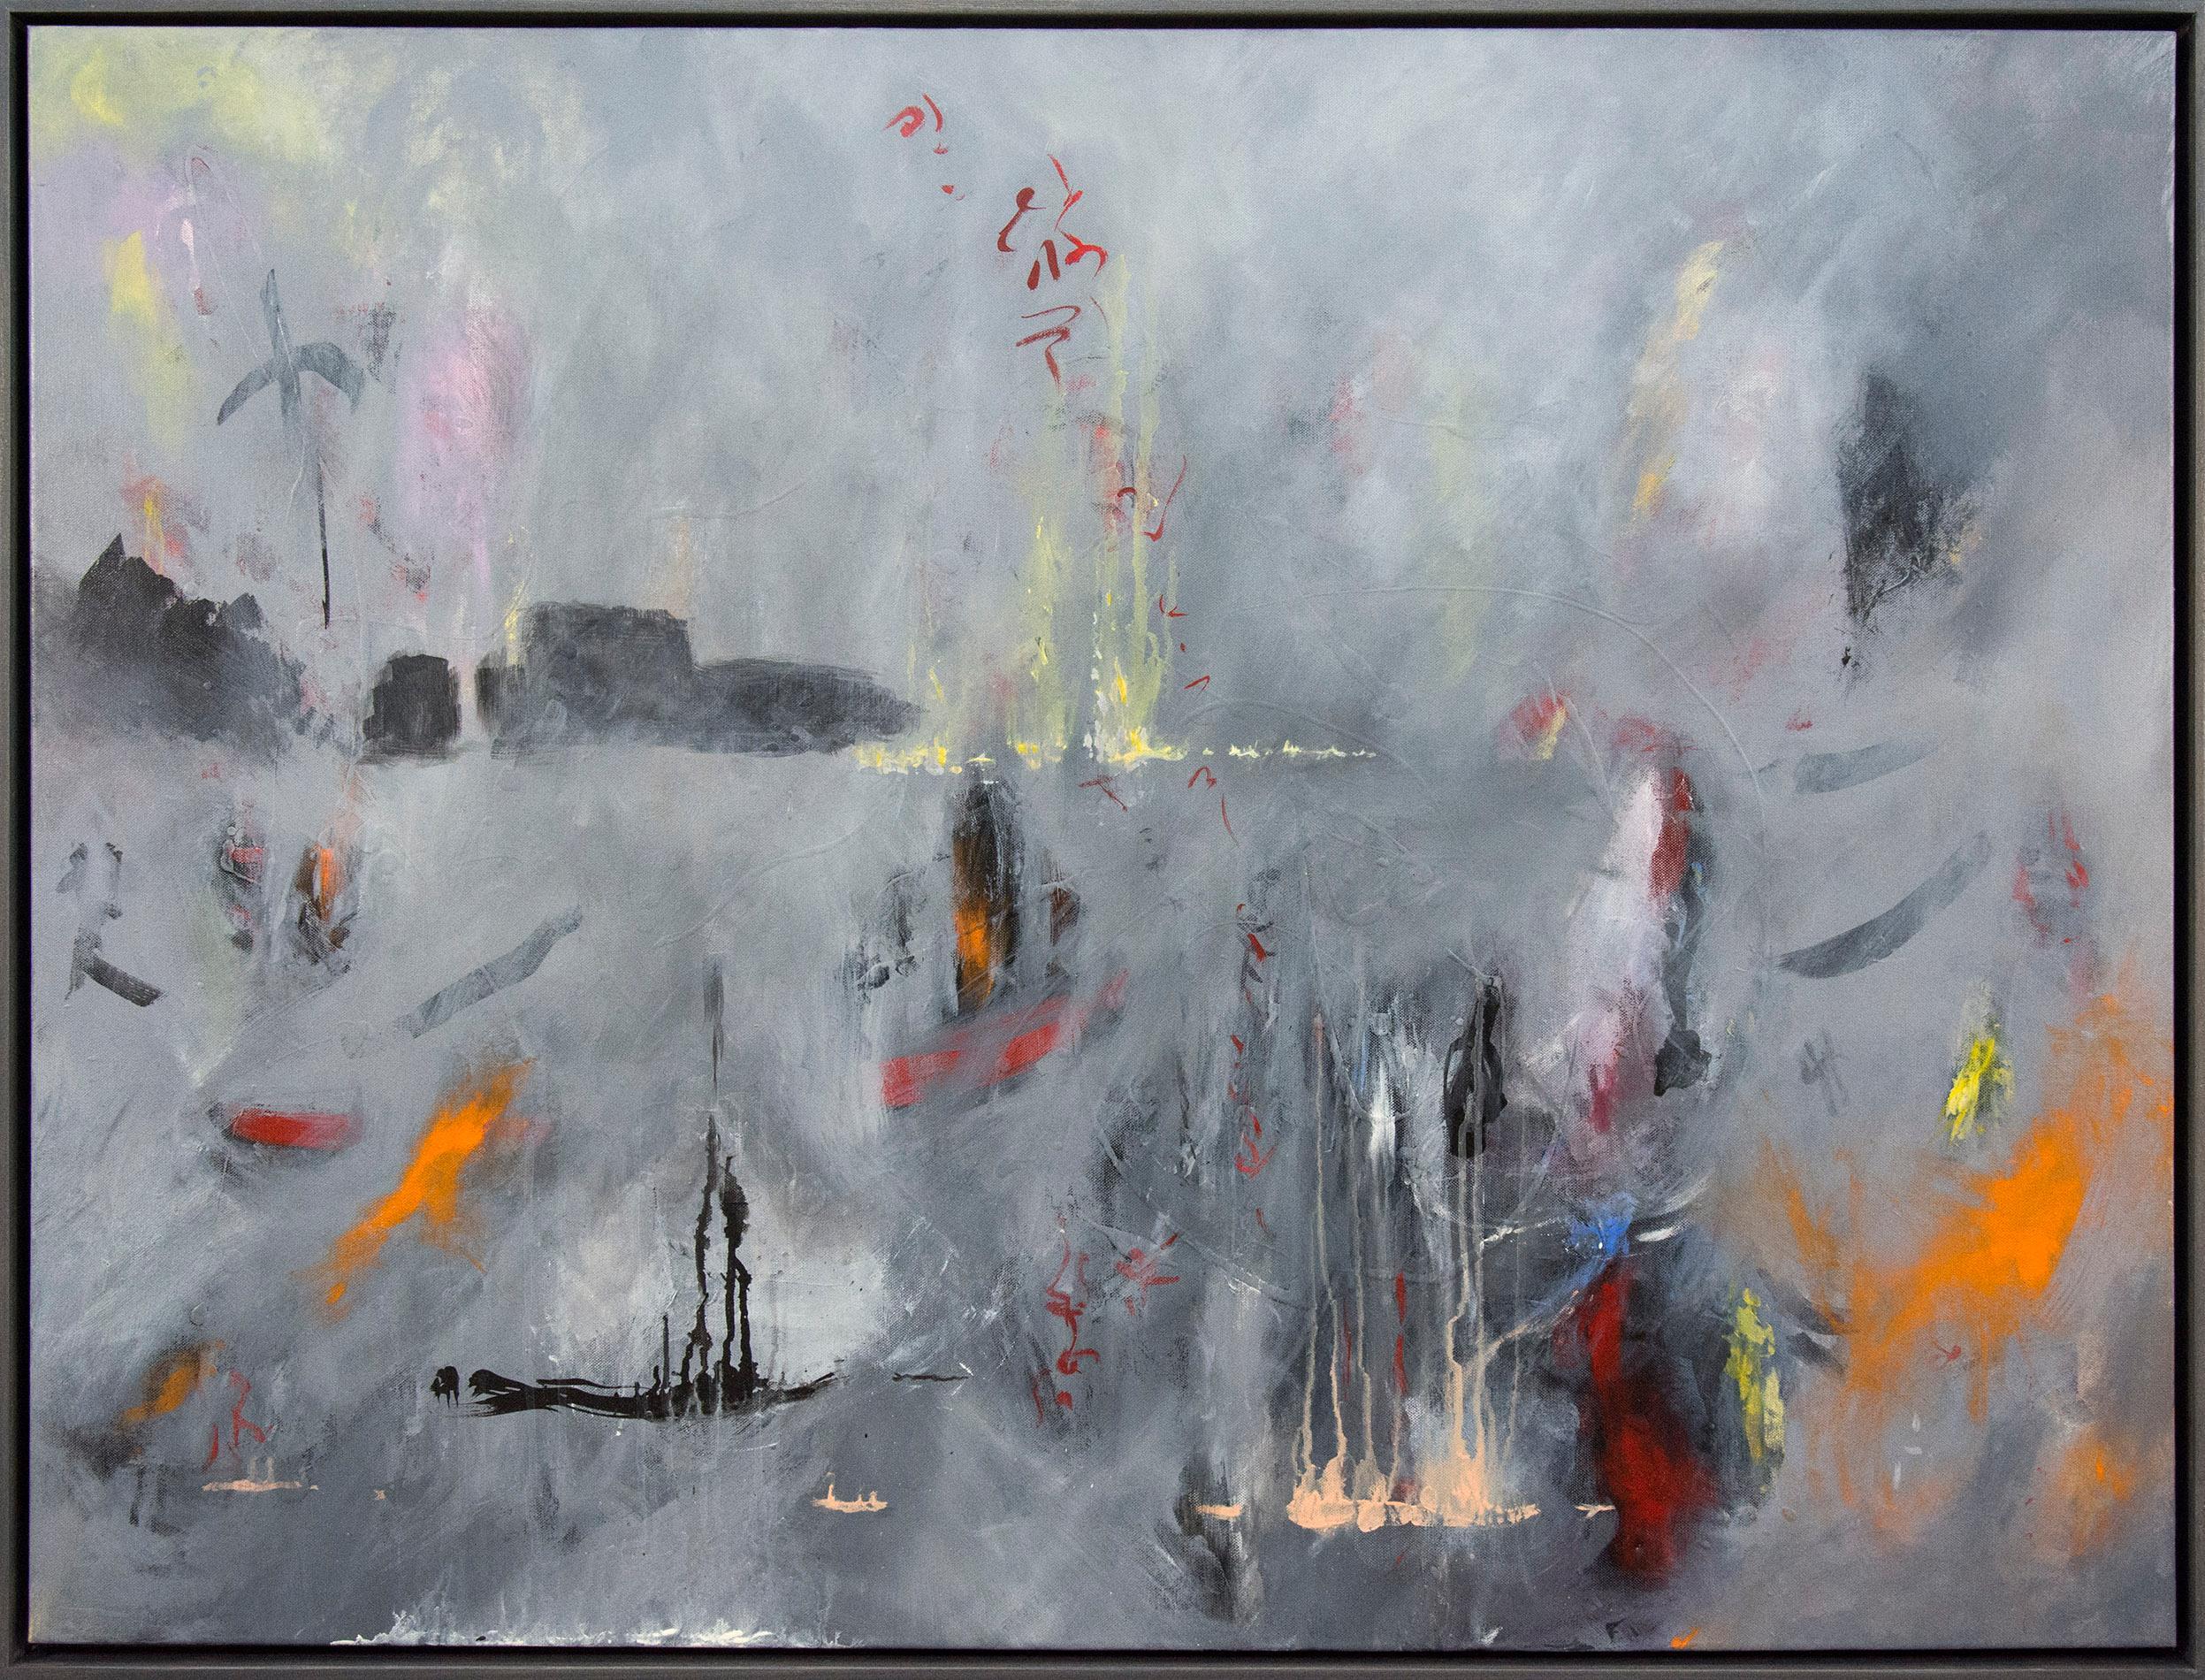 Avalon - large, warm, smokey grey, gestural, atmospheric acrylic on paper